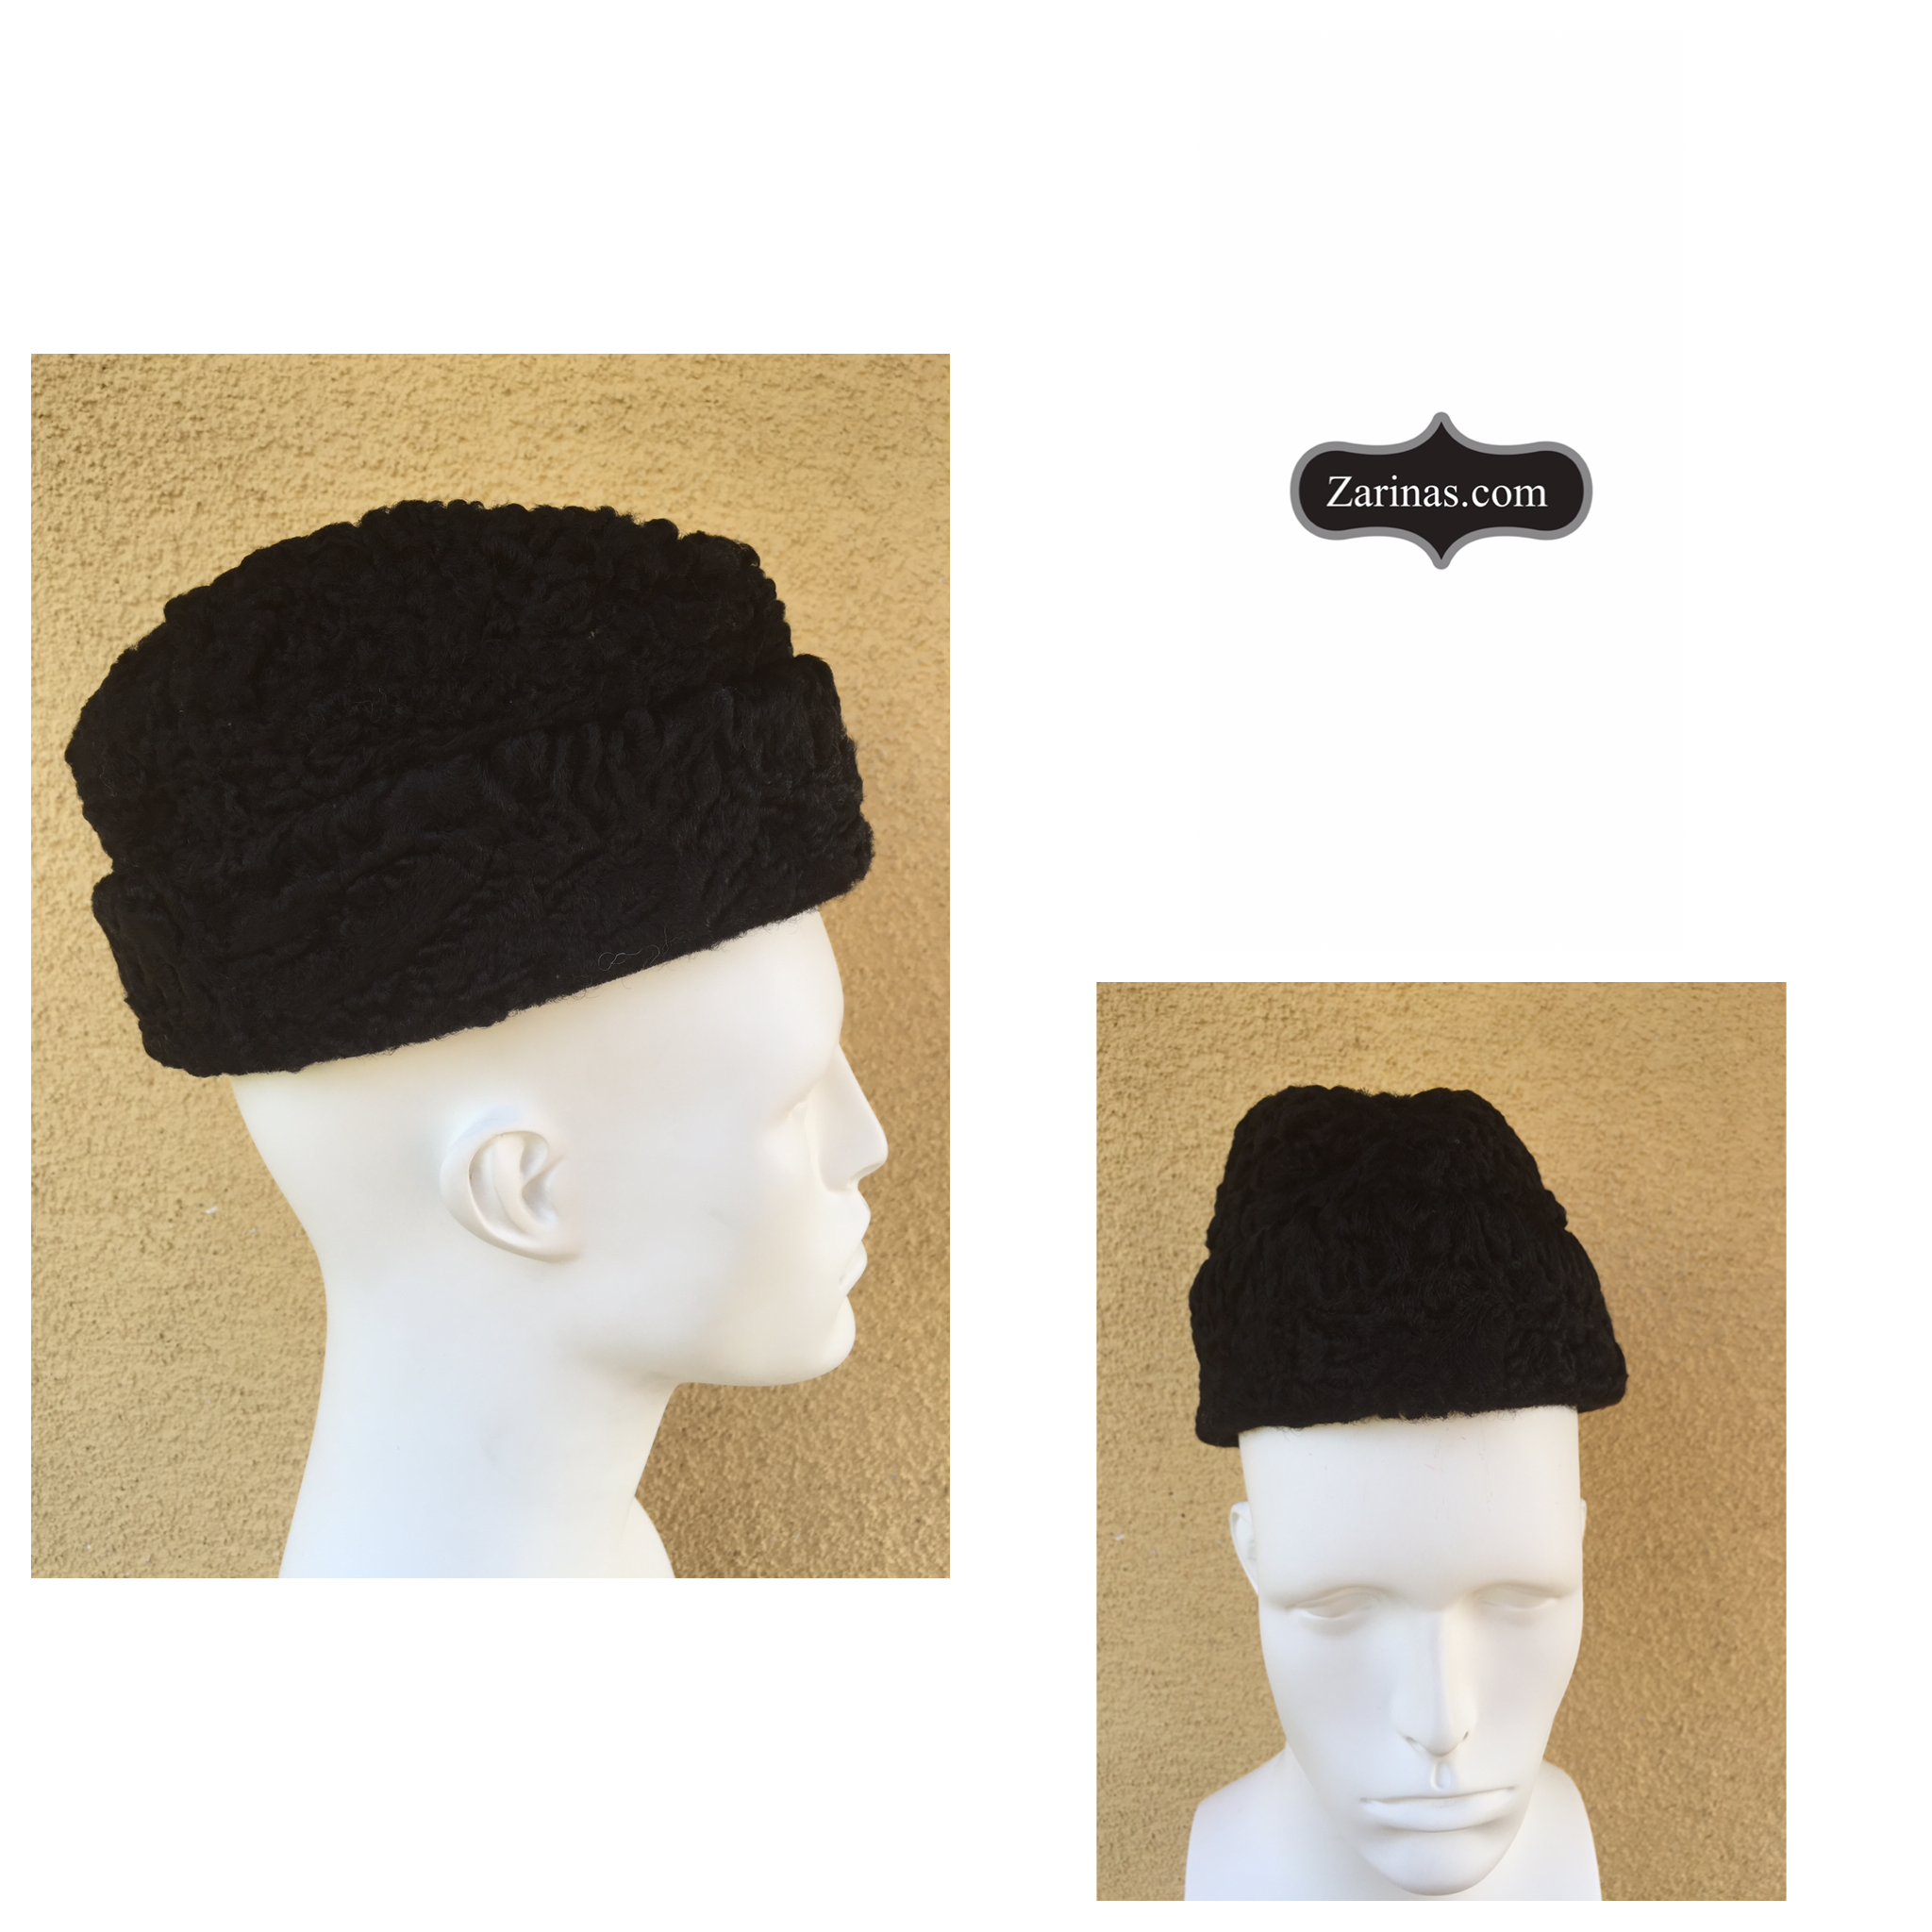 369880b38d4 Persian Lamb Ambassador Hat (also know as wool fur hat or Envoy hat).